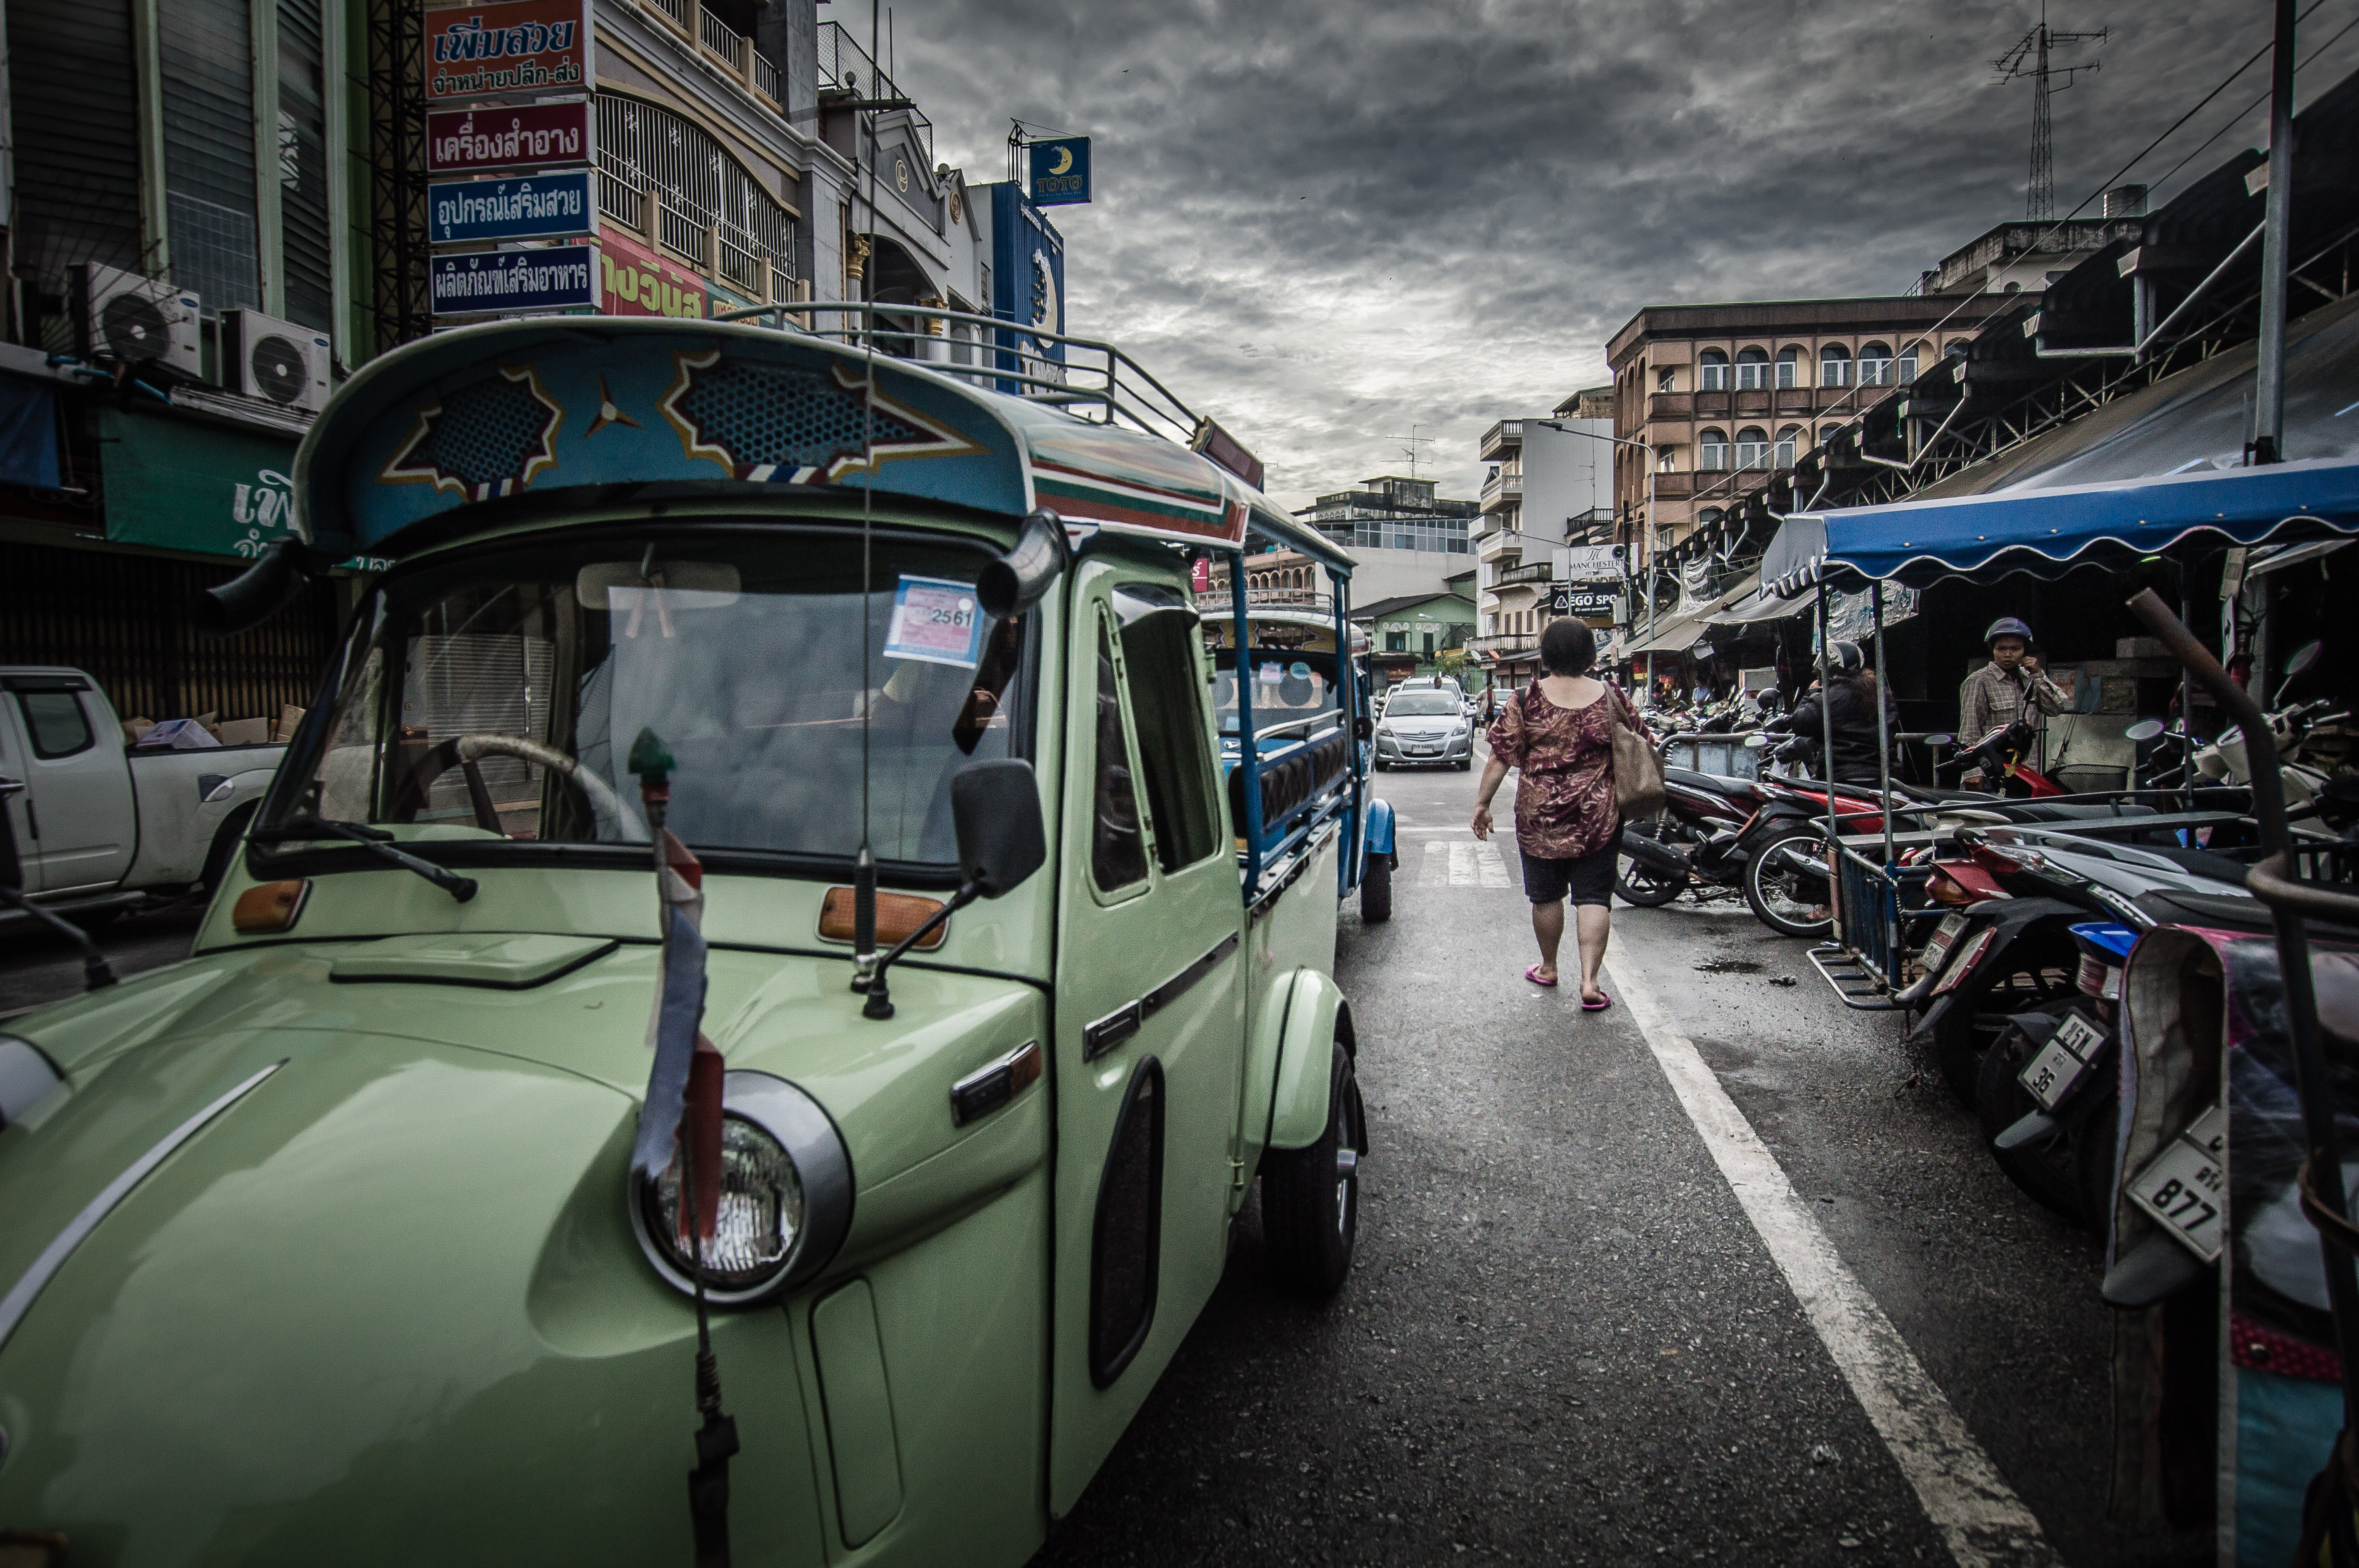 Woman Walking on the Street, People, Vintage, Vehicle, Urban, HQ Photo